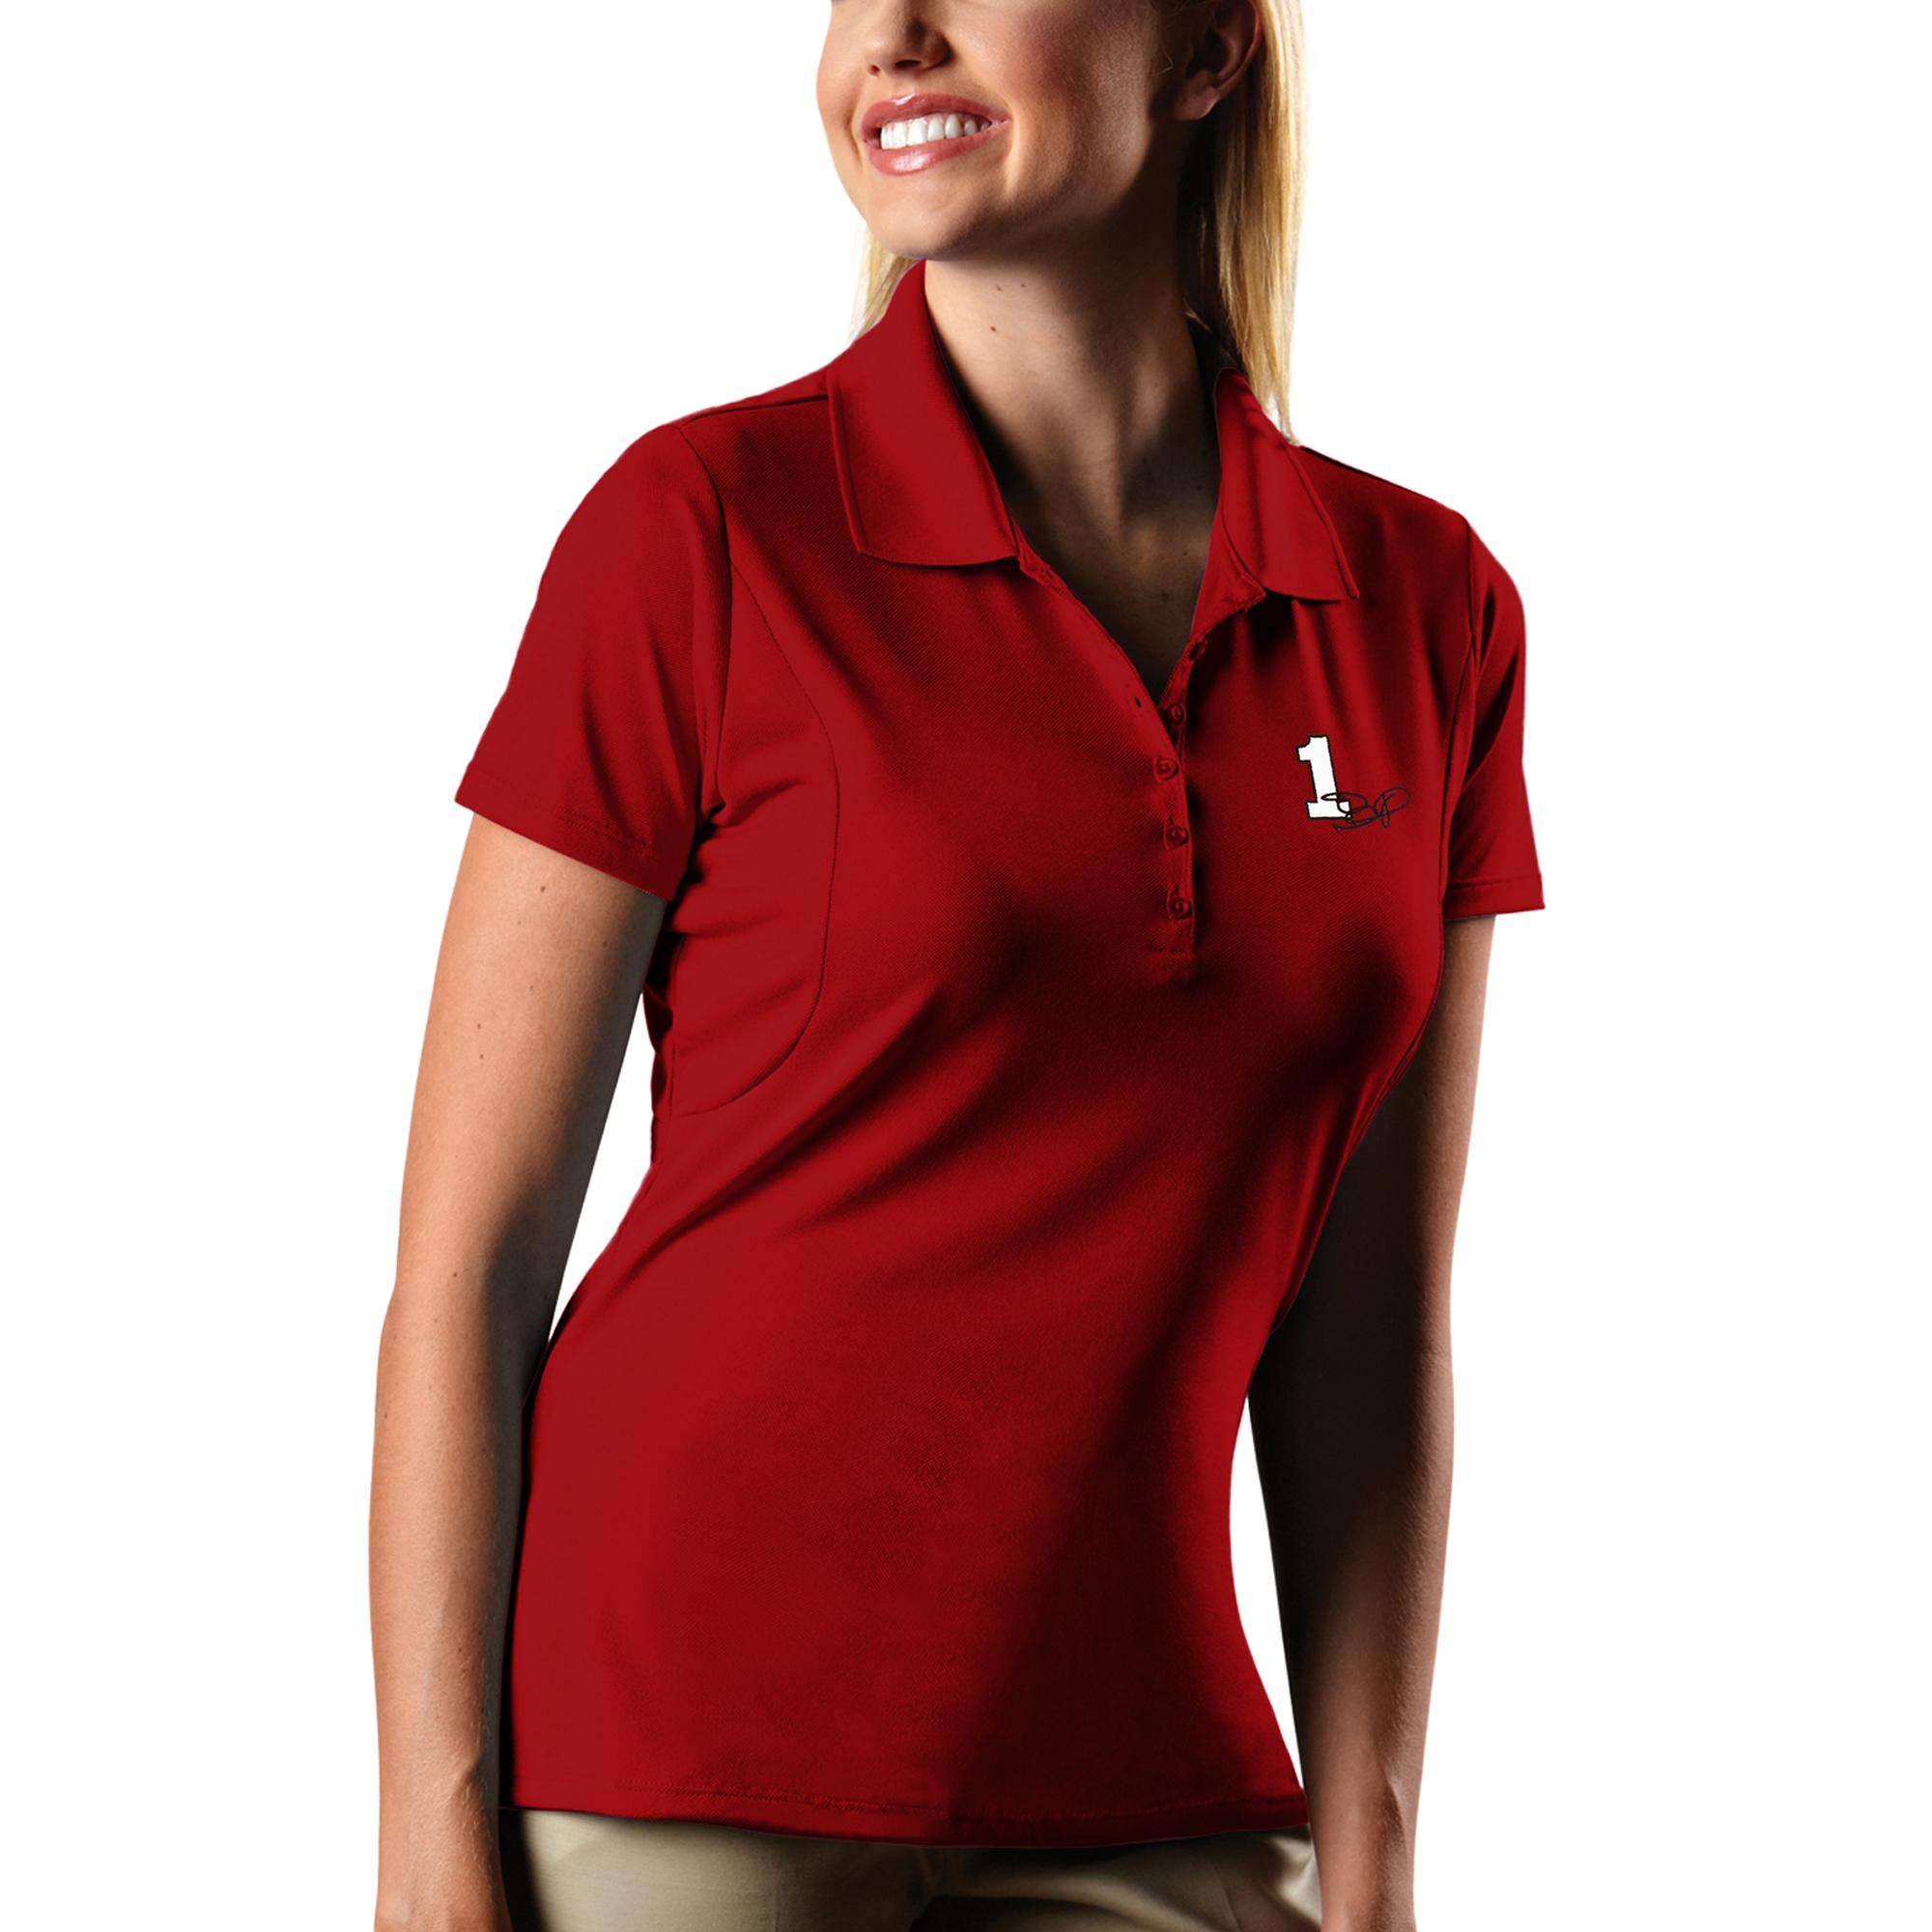 Jamie McMurray Women's Antigua Pique Desert Dry X-tra Lite Polo - Red